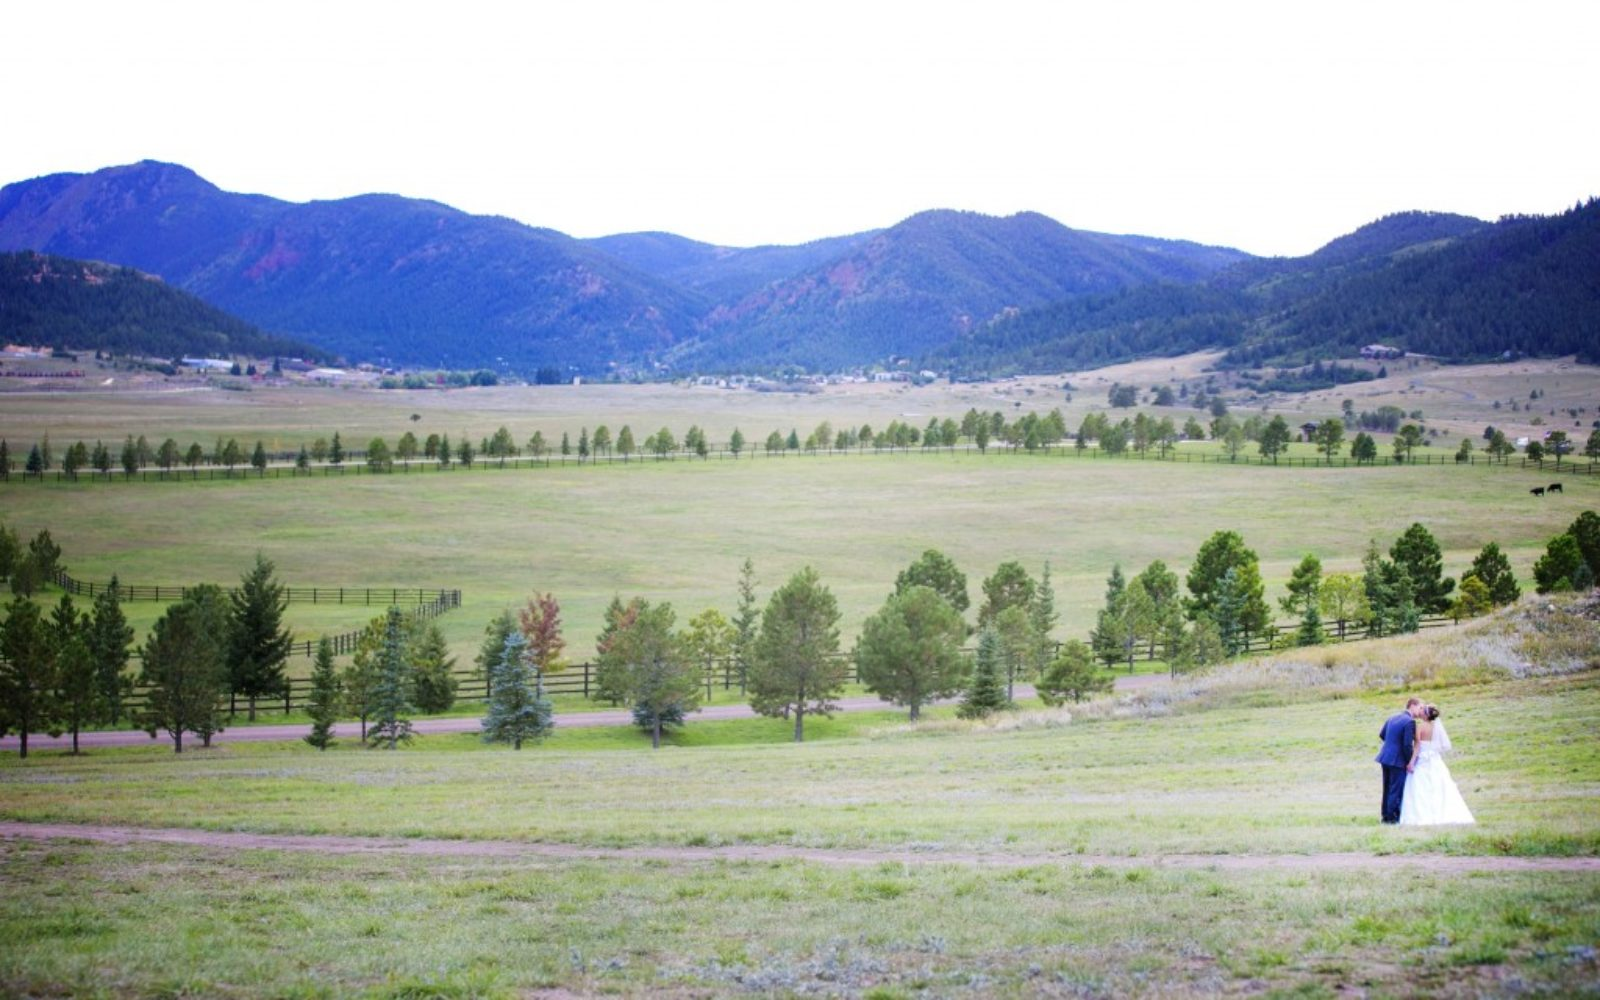 wedding-spruce-mtn-ranch-1024x640